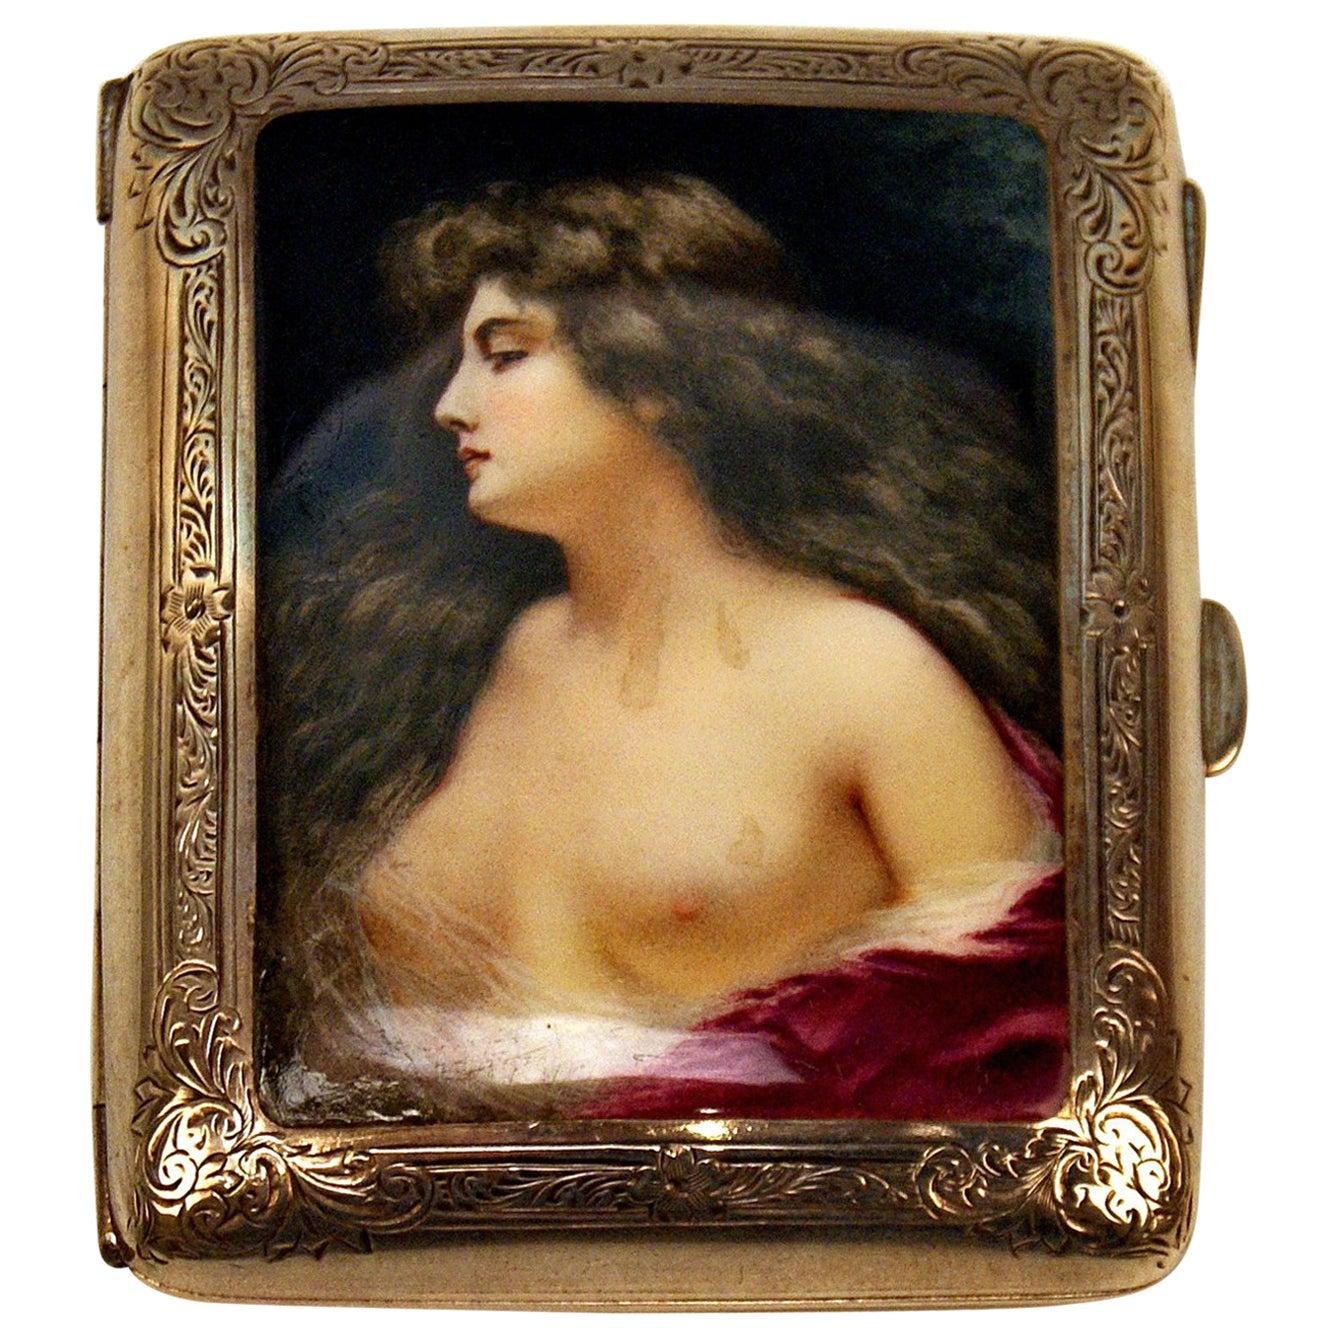 Sterling Silver Erotica Cigarette Box Enamel Painting Lady Nude, Birmingham 1902